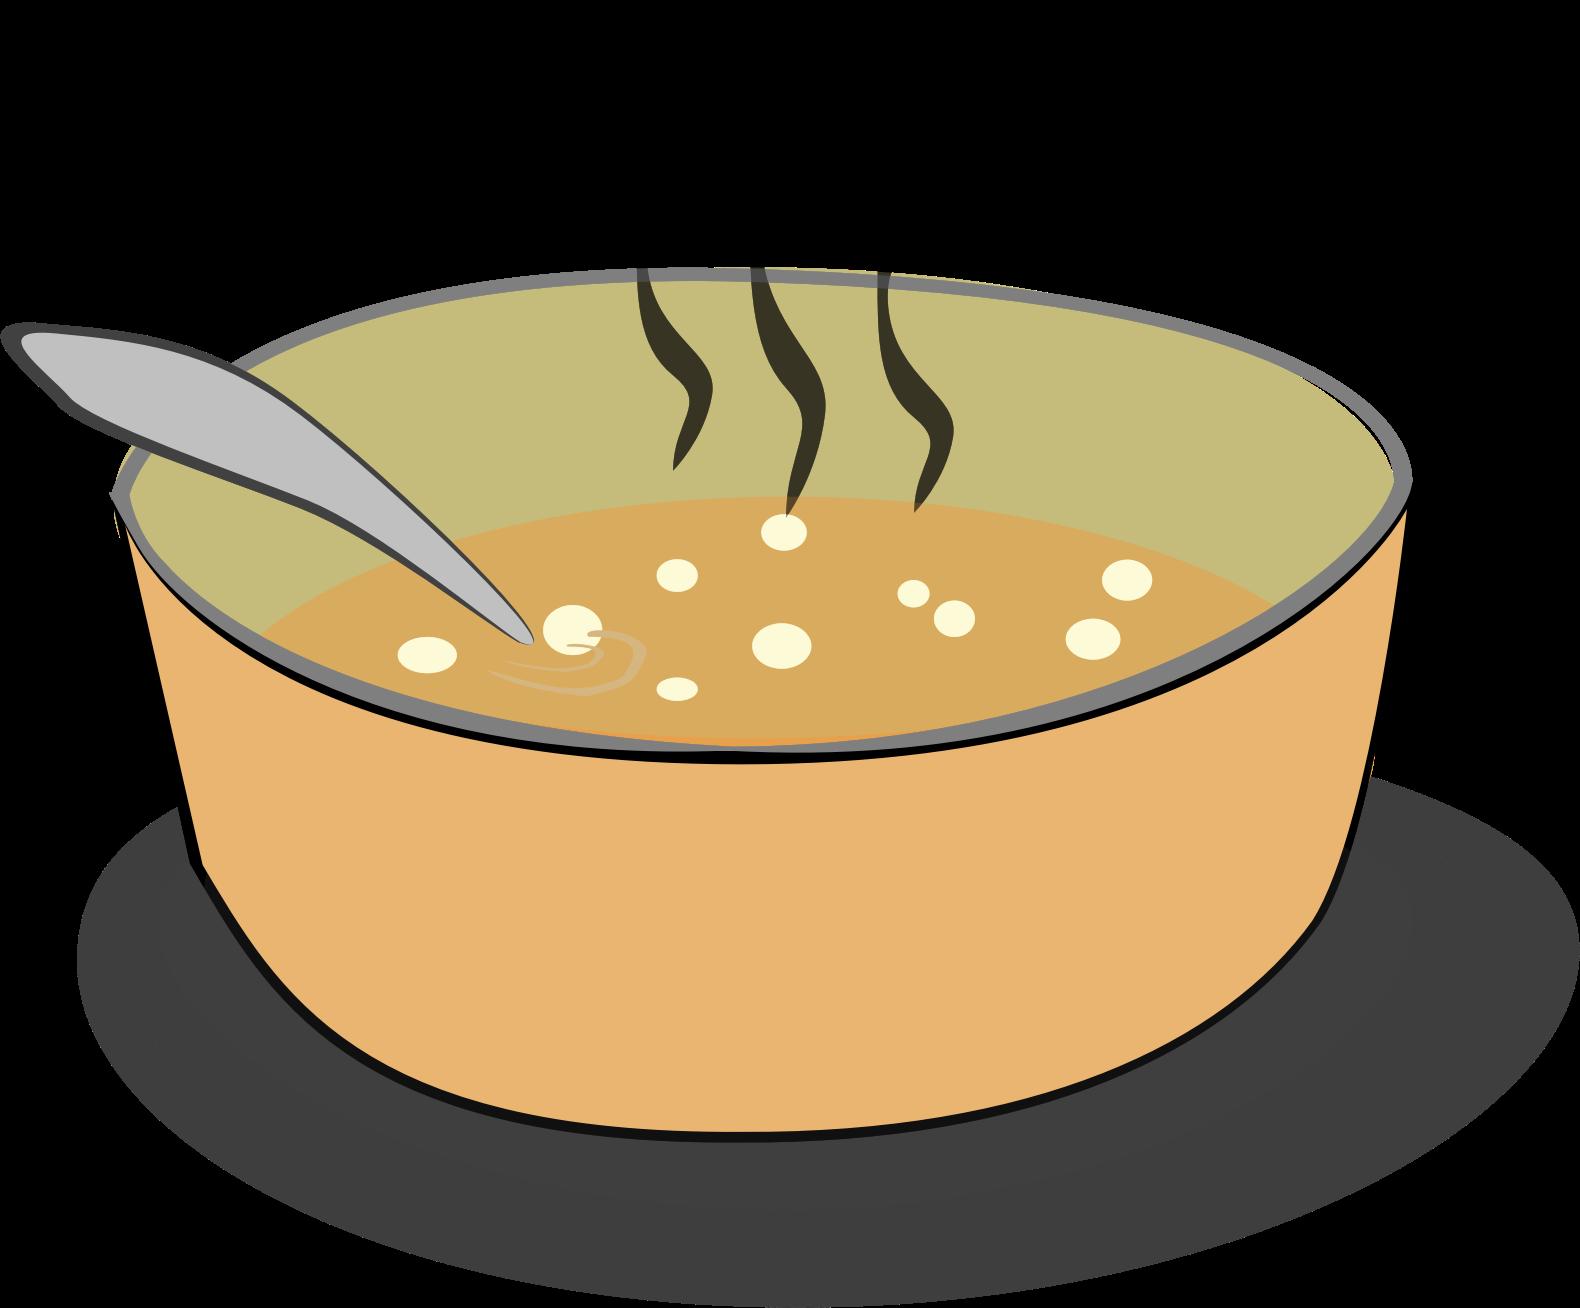 Hulasch. Soup clipart soup tureen